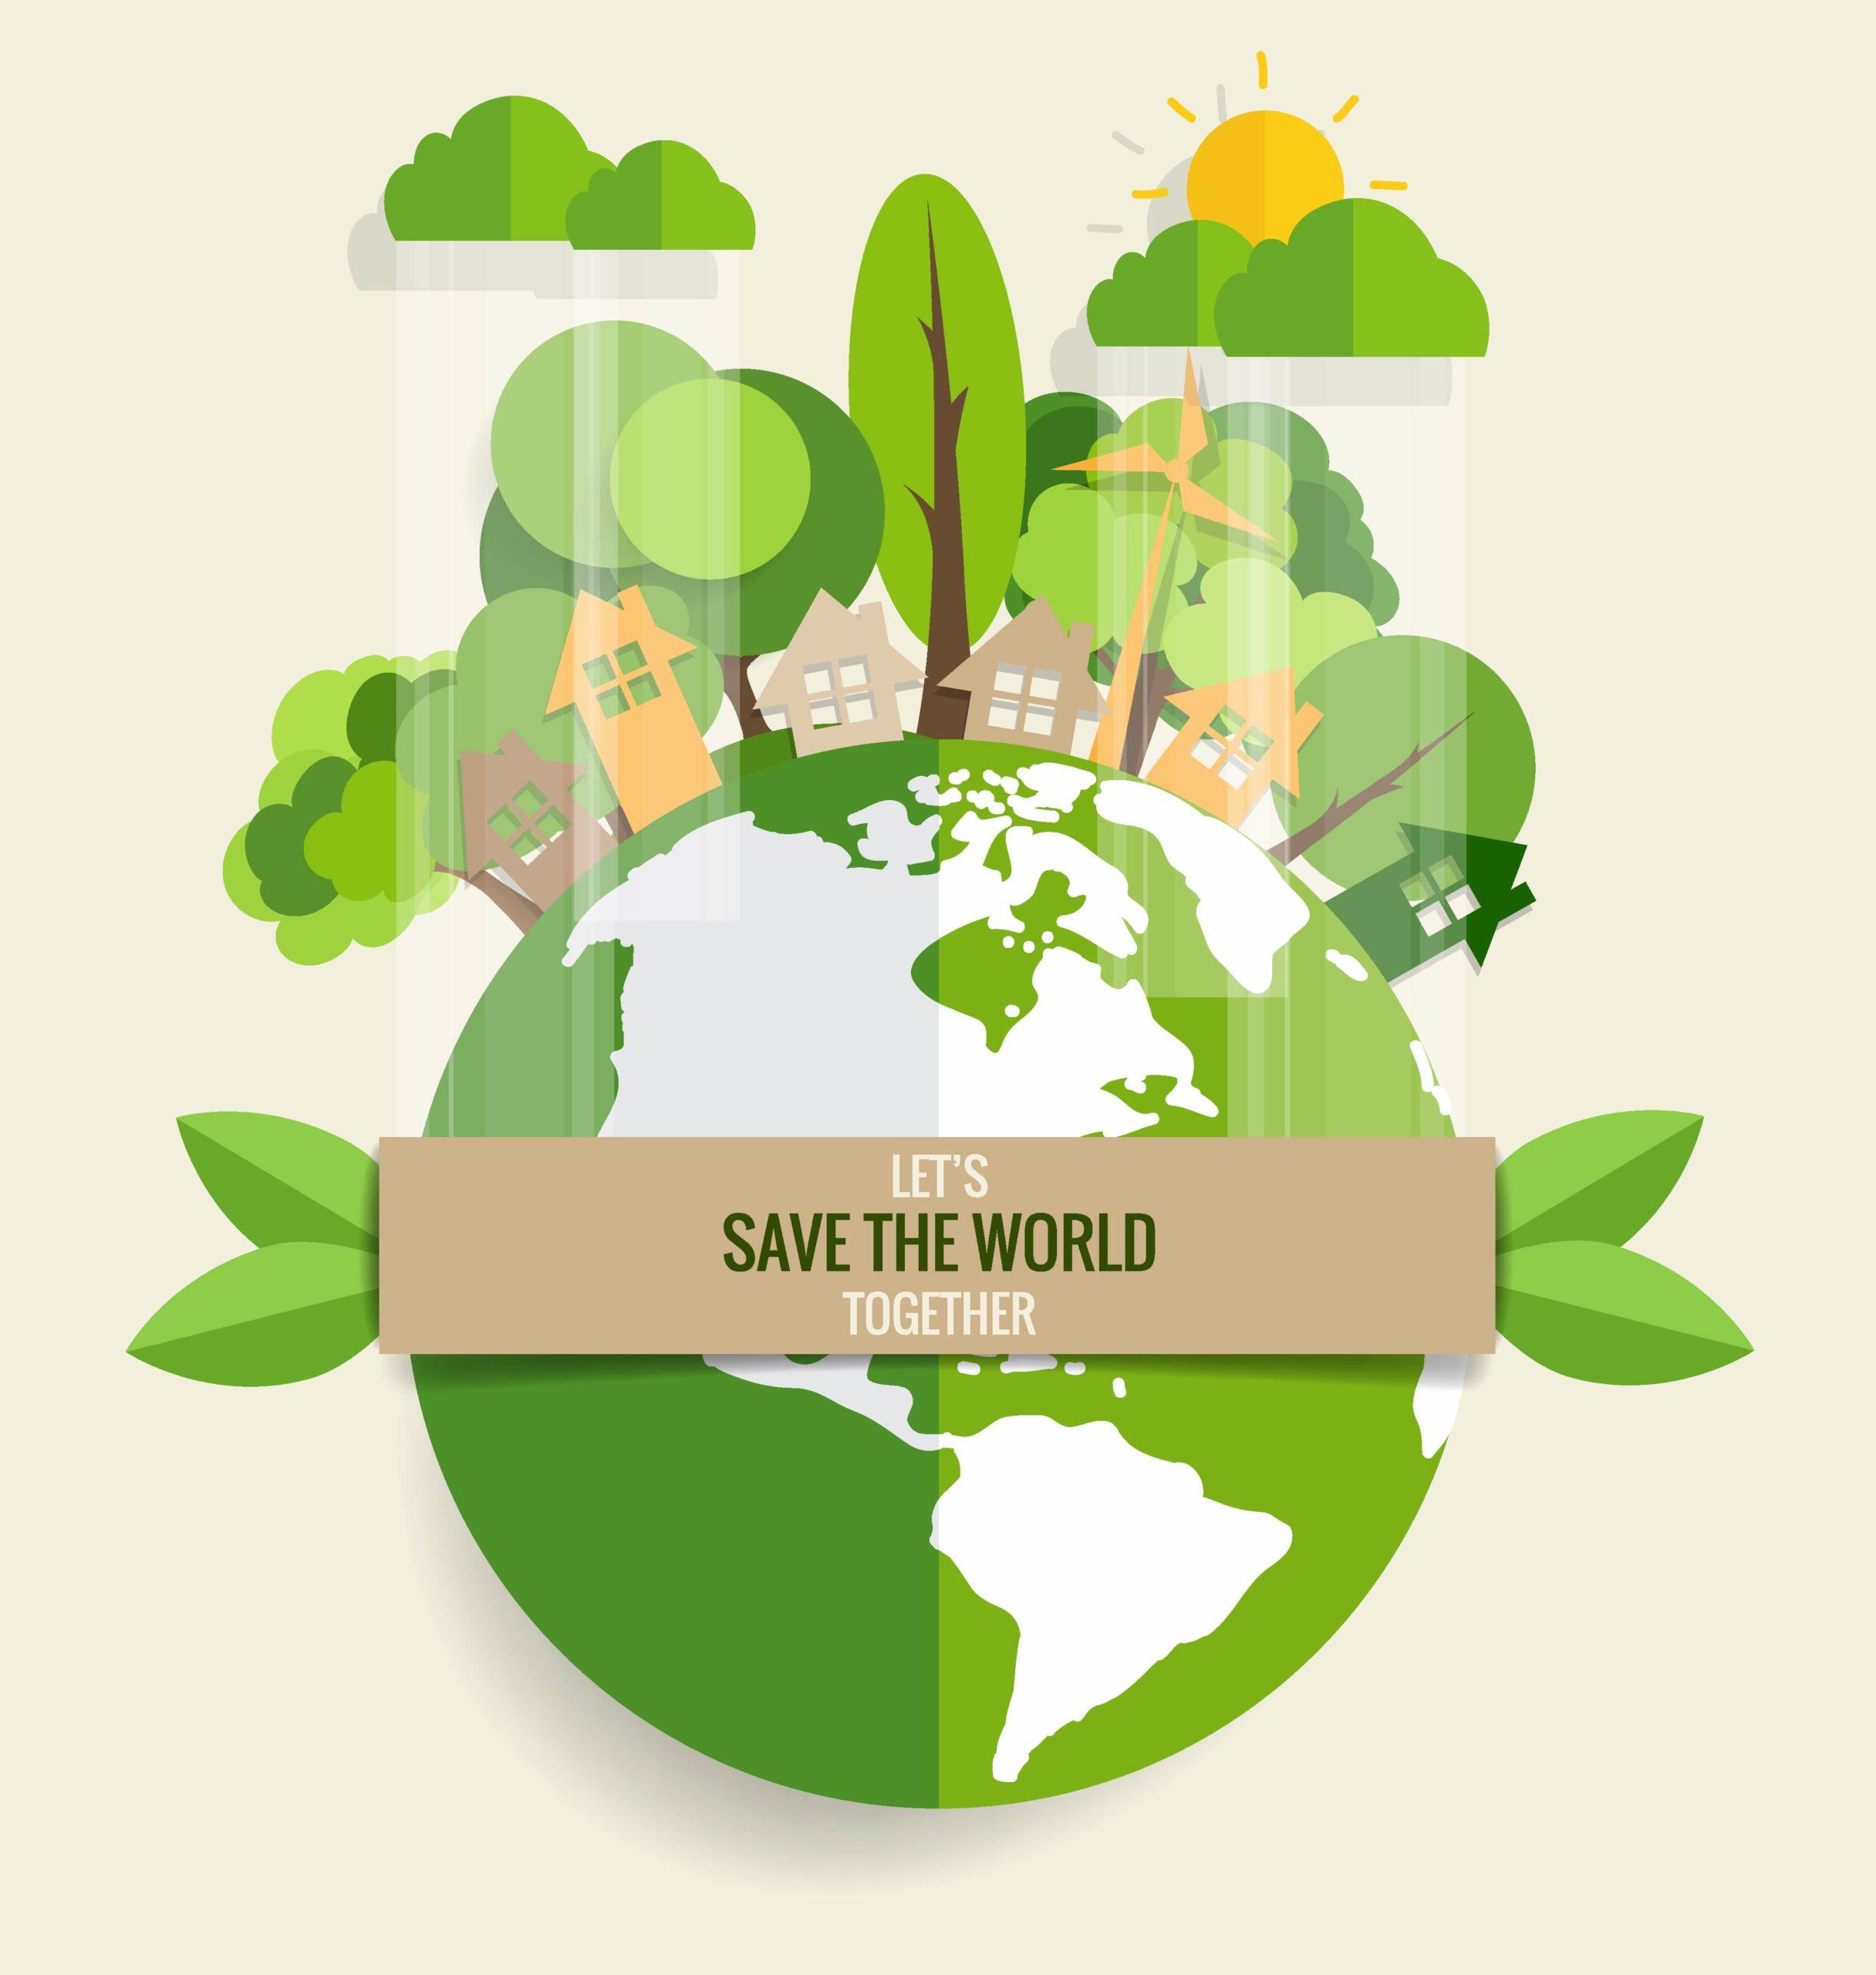 Programma Tree Cities of World